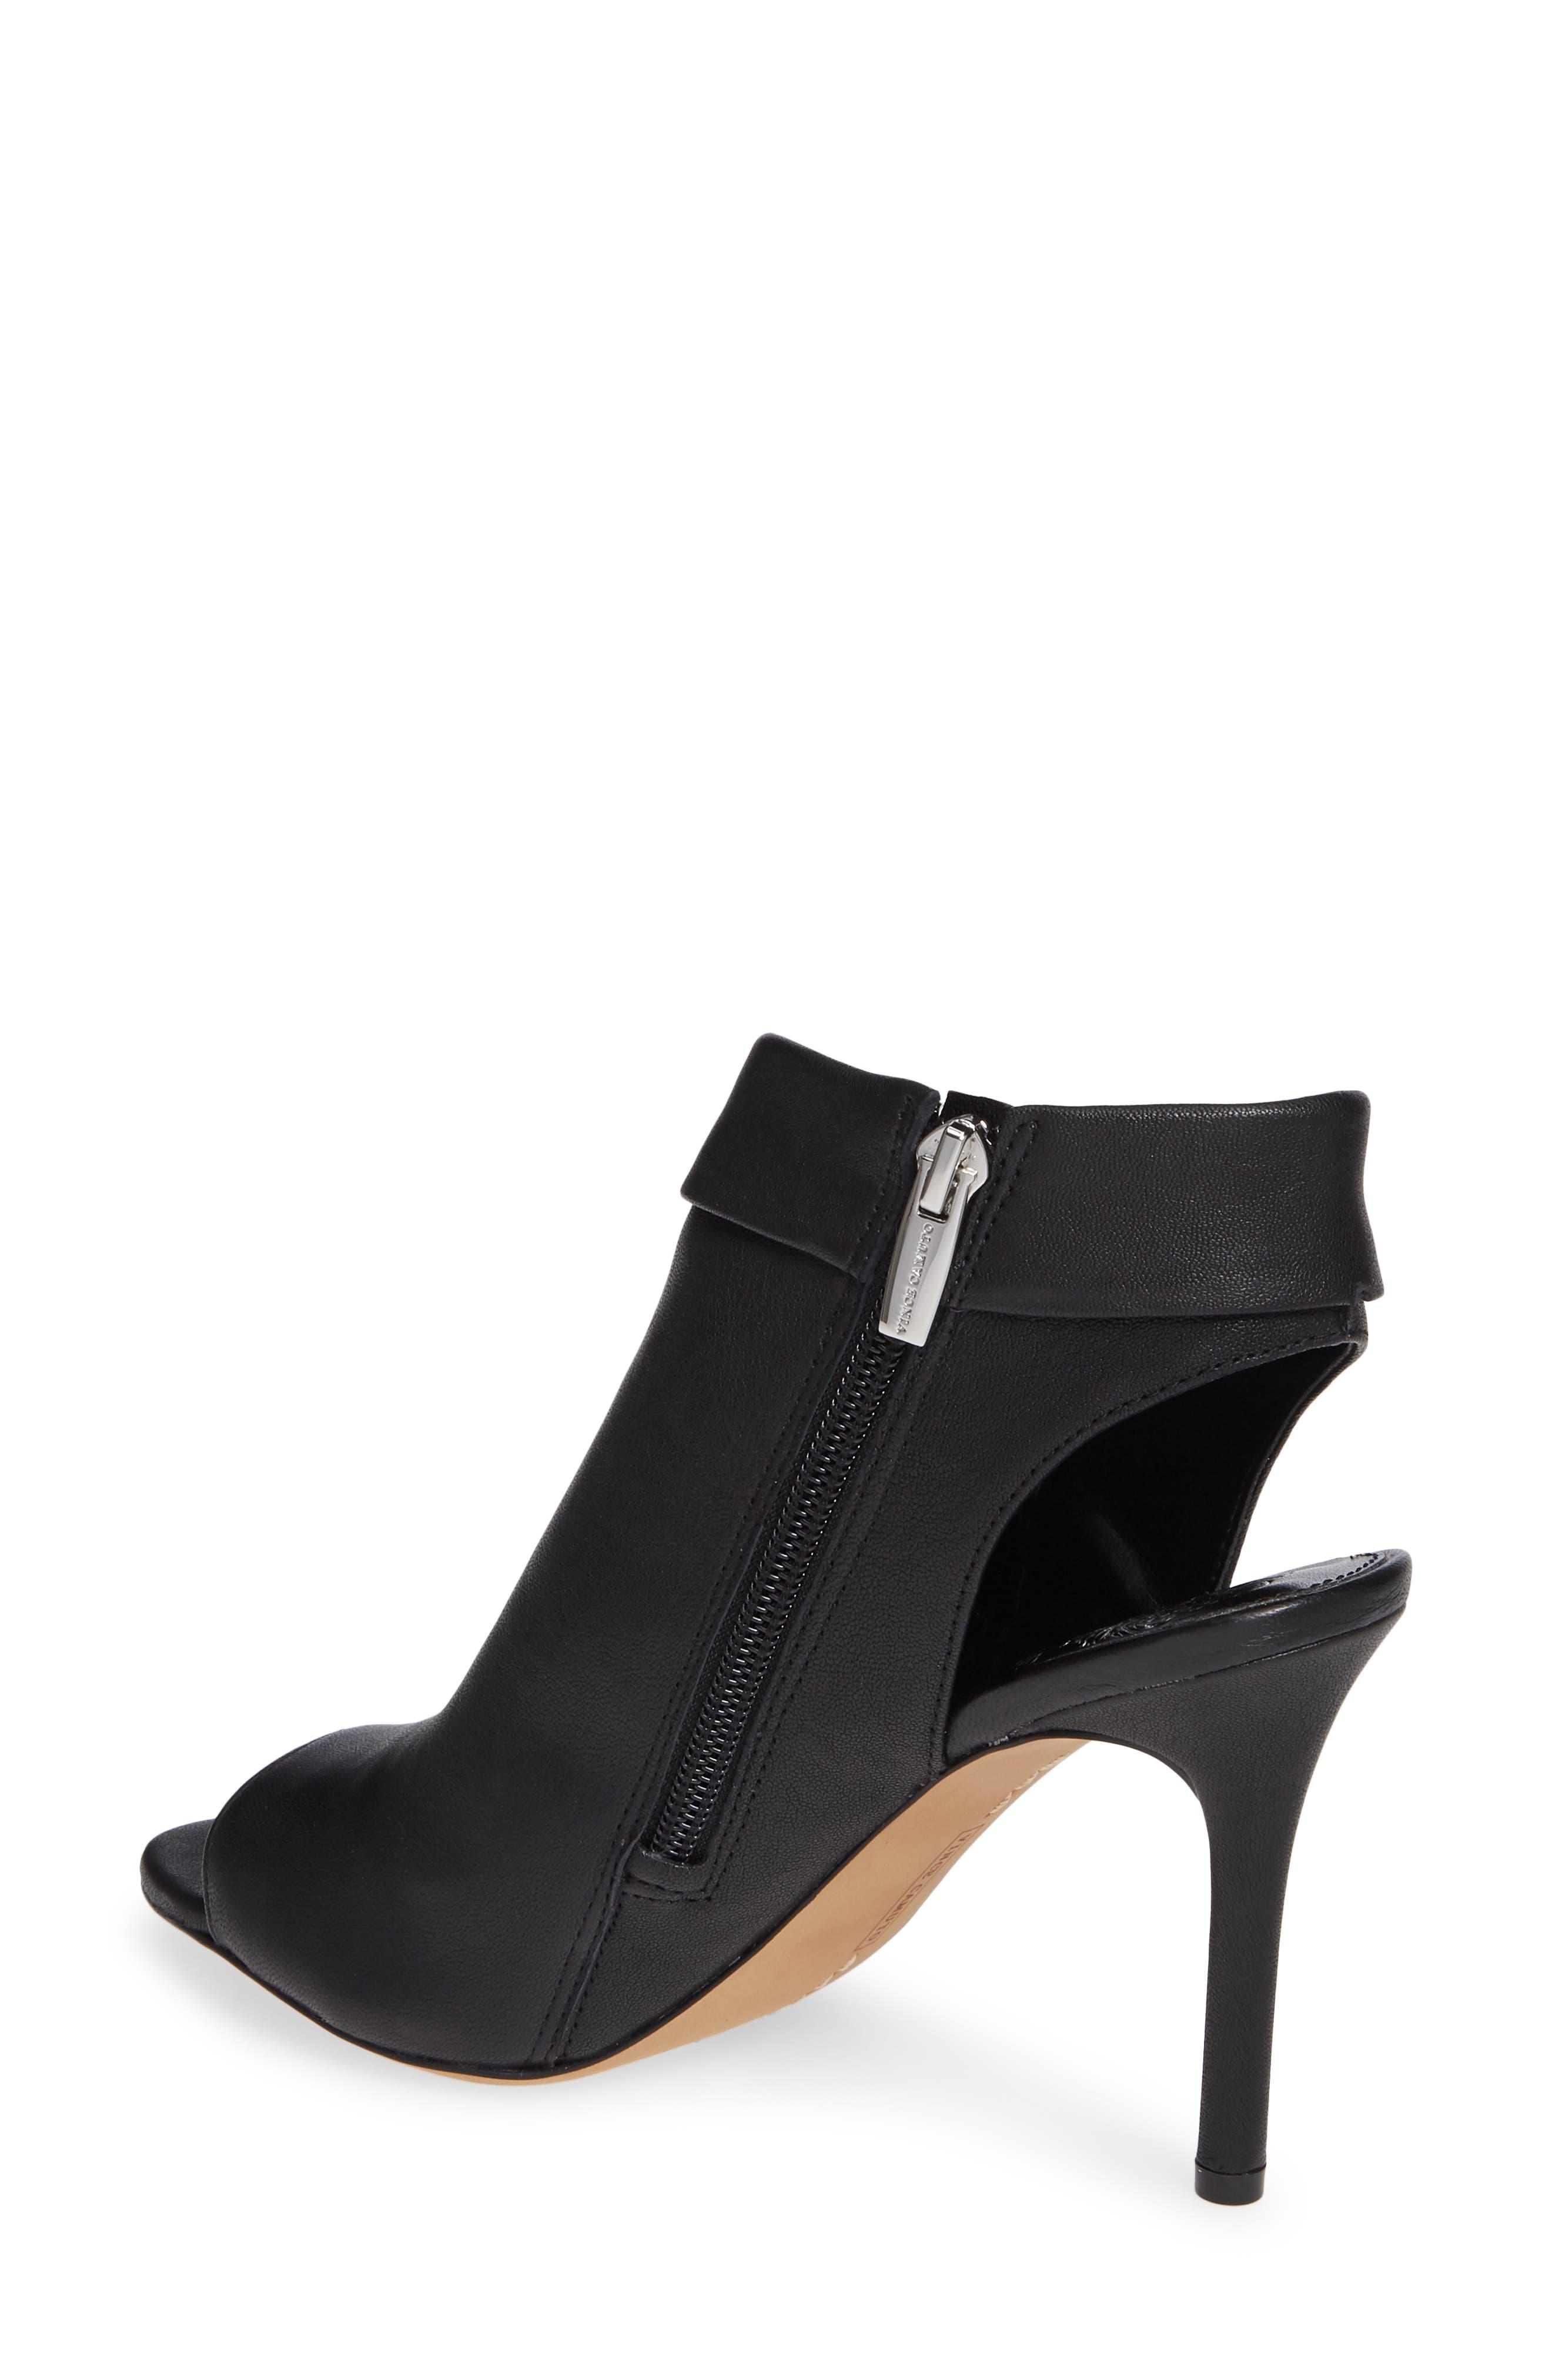 Cholia Asymmetrical Sandal Bootie,                             Alternate thumbnail 2, color,                             BLACK LEATHER